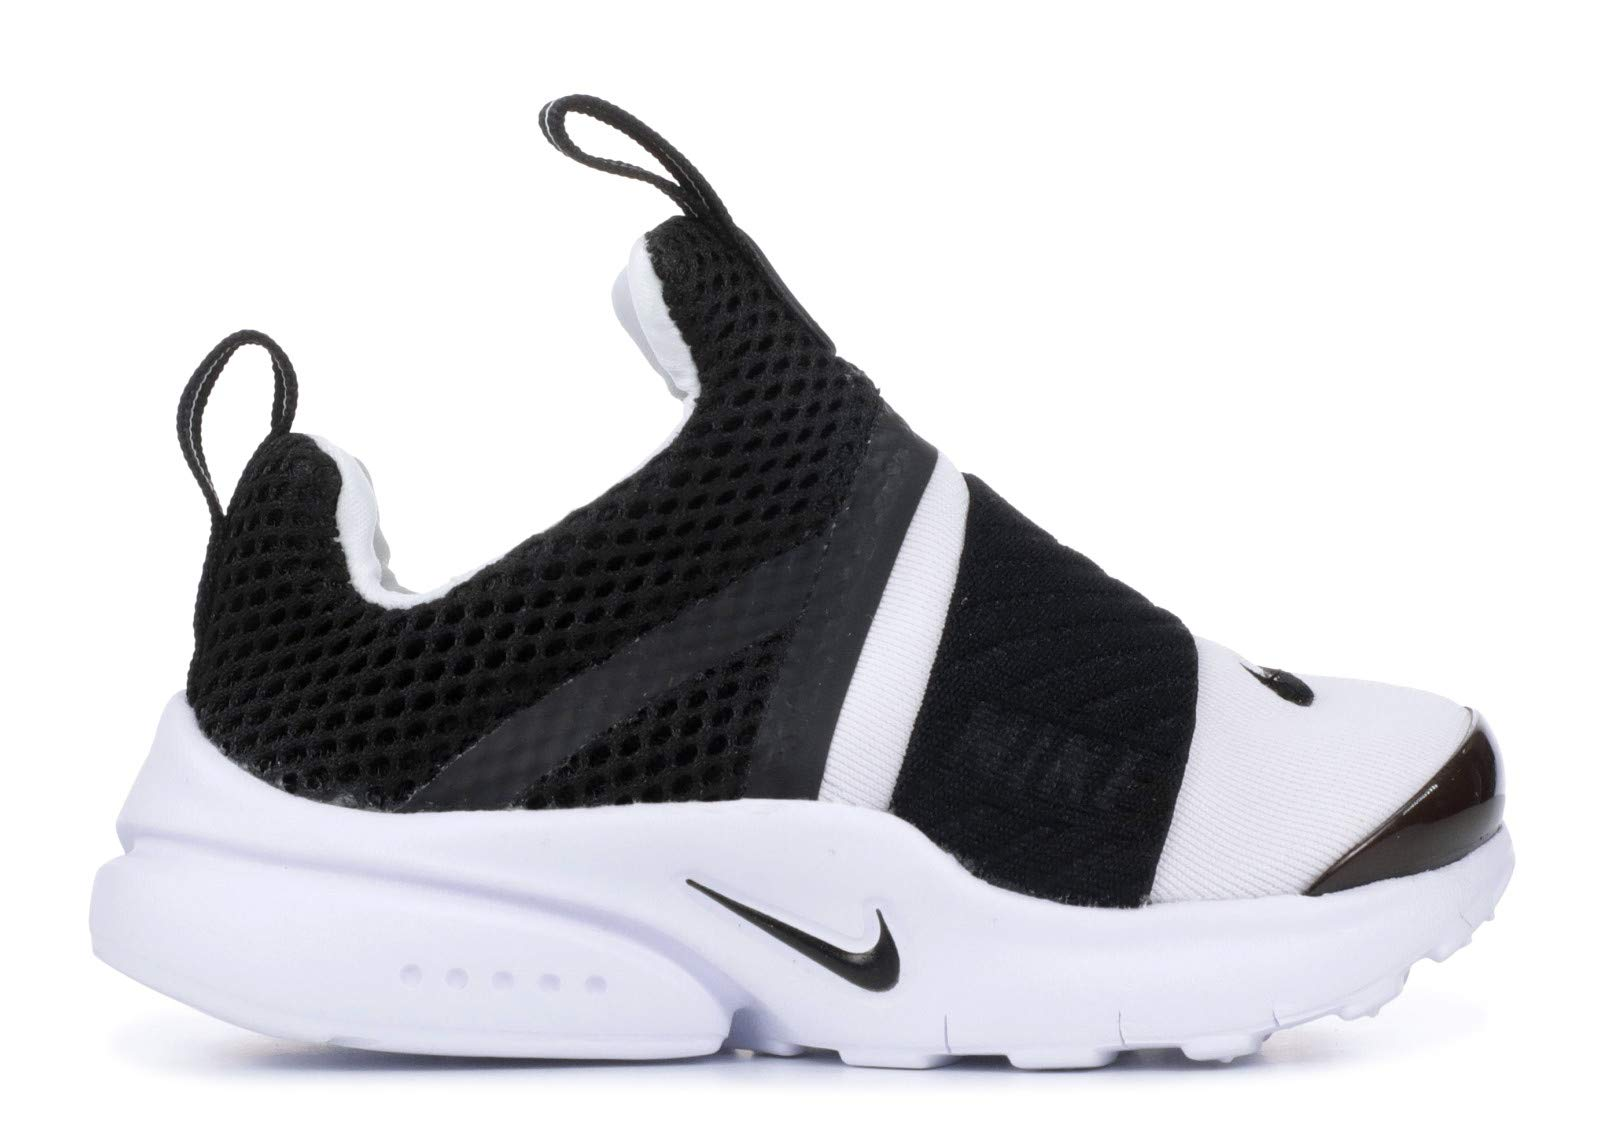 Nike Presto Extreme Toddler's Running Shoes White/Black 870019-100 (6 M US)